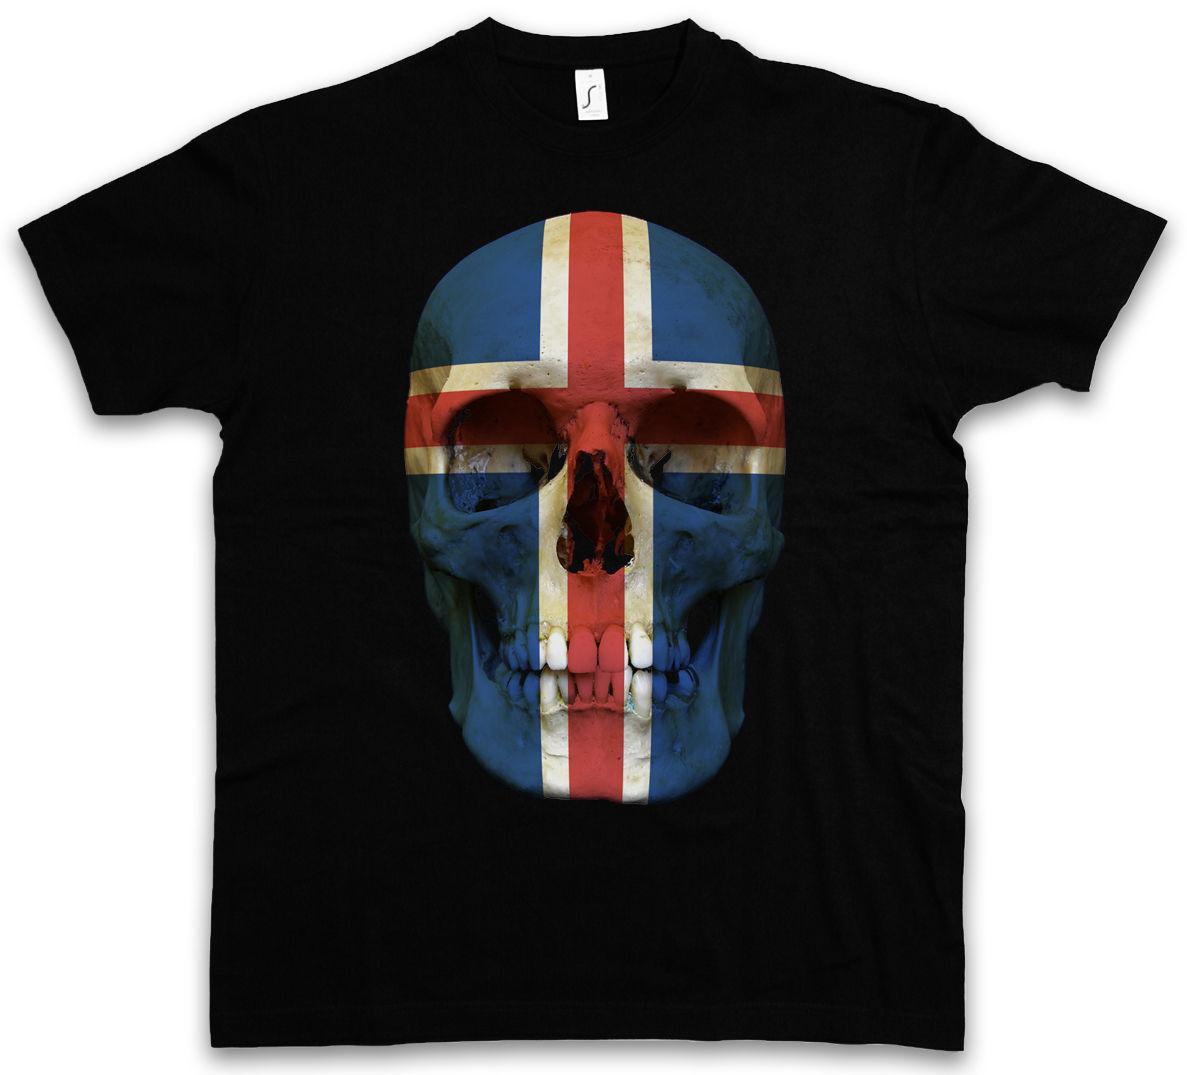 CLASSIC ICELAND SKULL FLAG T-SHIRT - Biker MC Banner Shirt Sizes S - 5XL  Cool Casual pride t shirt men Unisex New Fashion